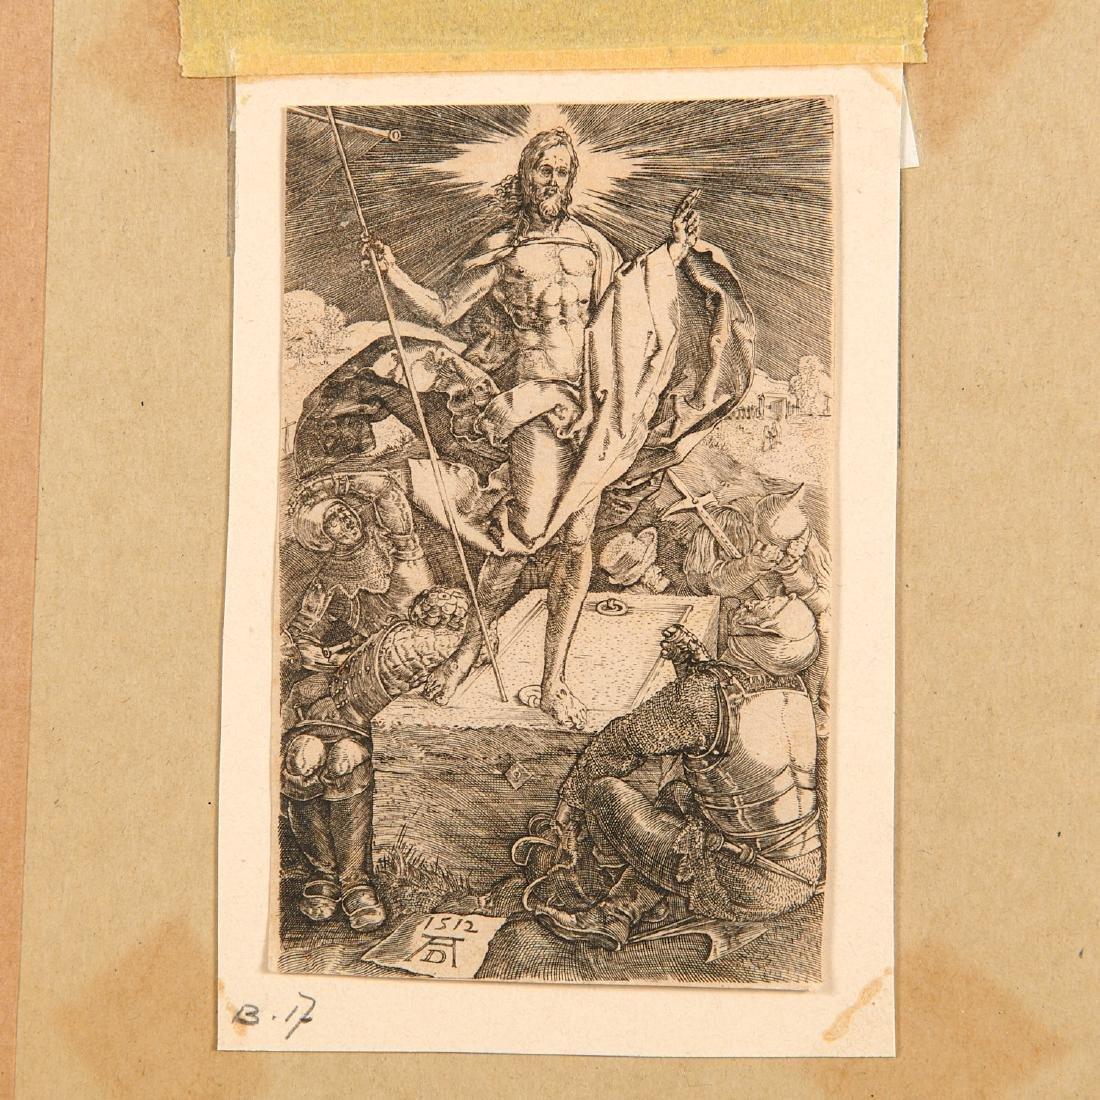 Albrecht Durer, engraving - 5